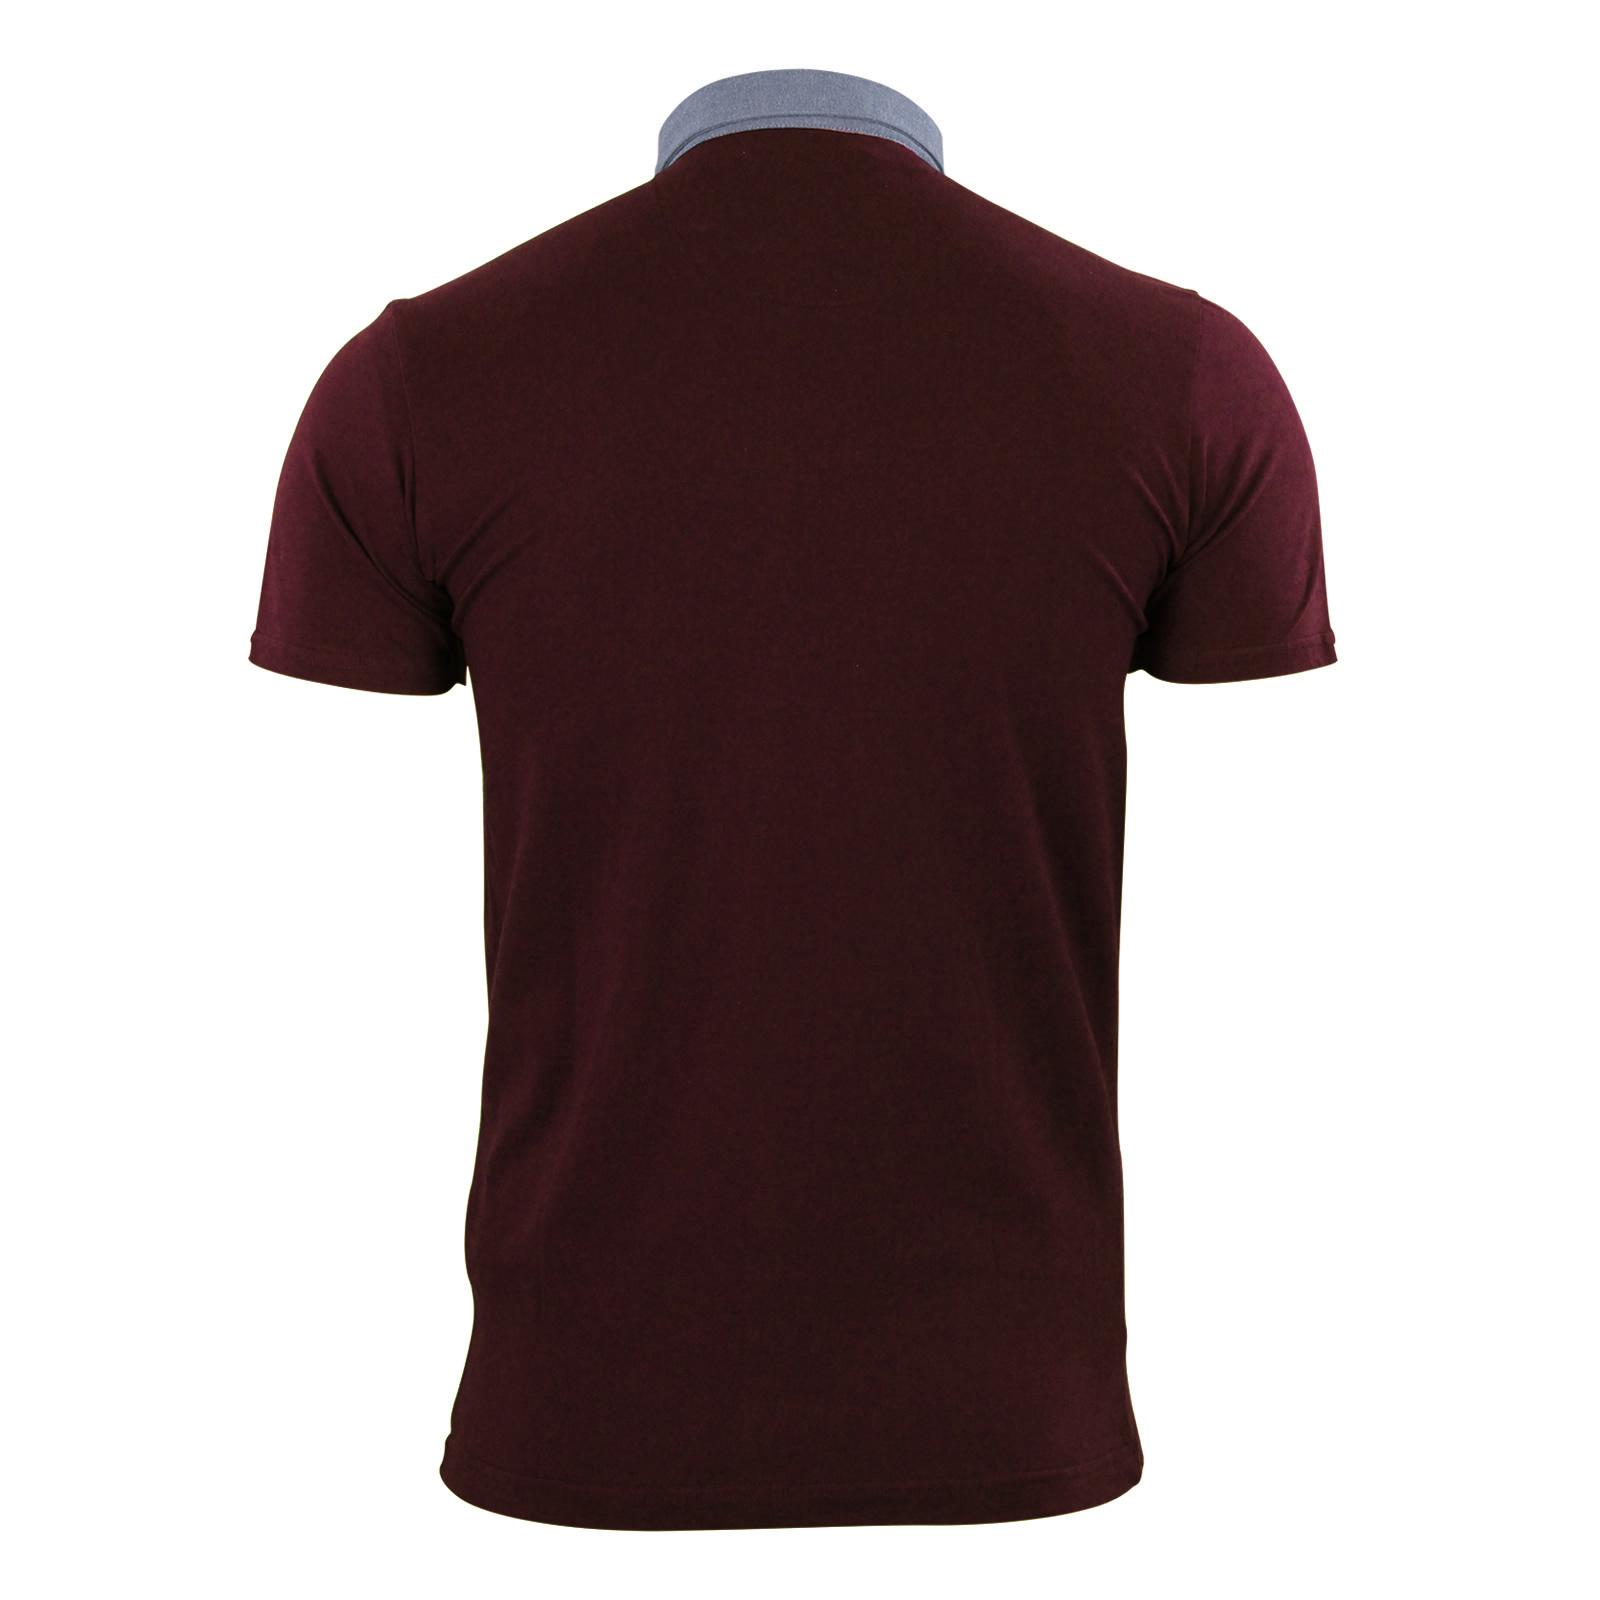 Mens-Polo-T-Shirt-Brave-Soul-Chimera-Chambray-Collared-Cotton-Casual-Top thumbnail 3